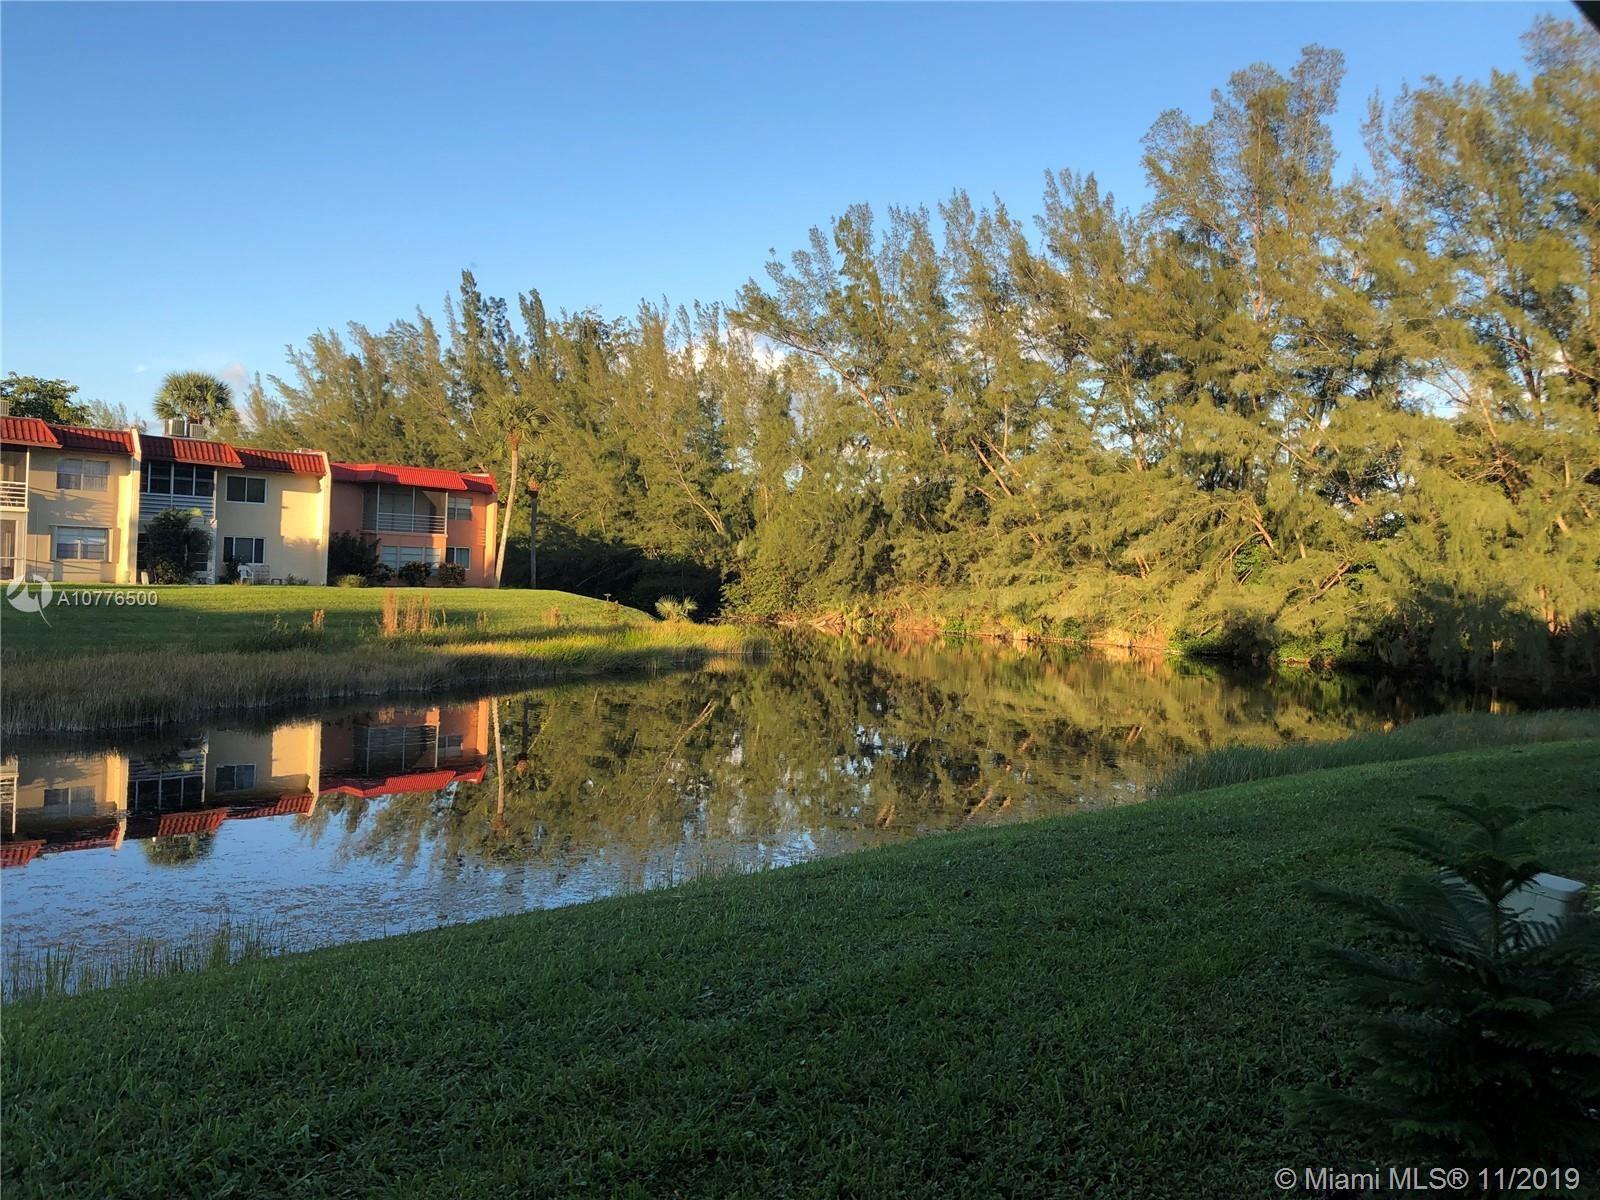 229 Lake Frances Dr #229, West Palm Beach, FL 33411 - #: A10776500